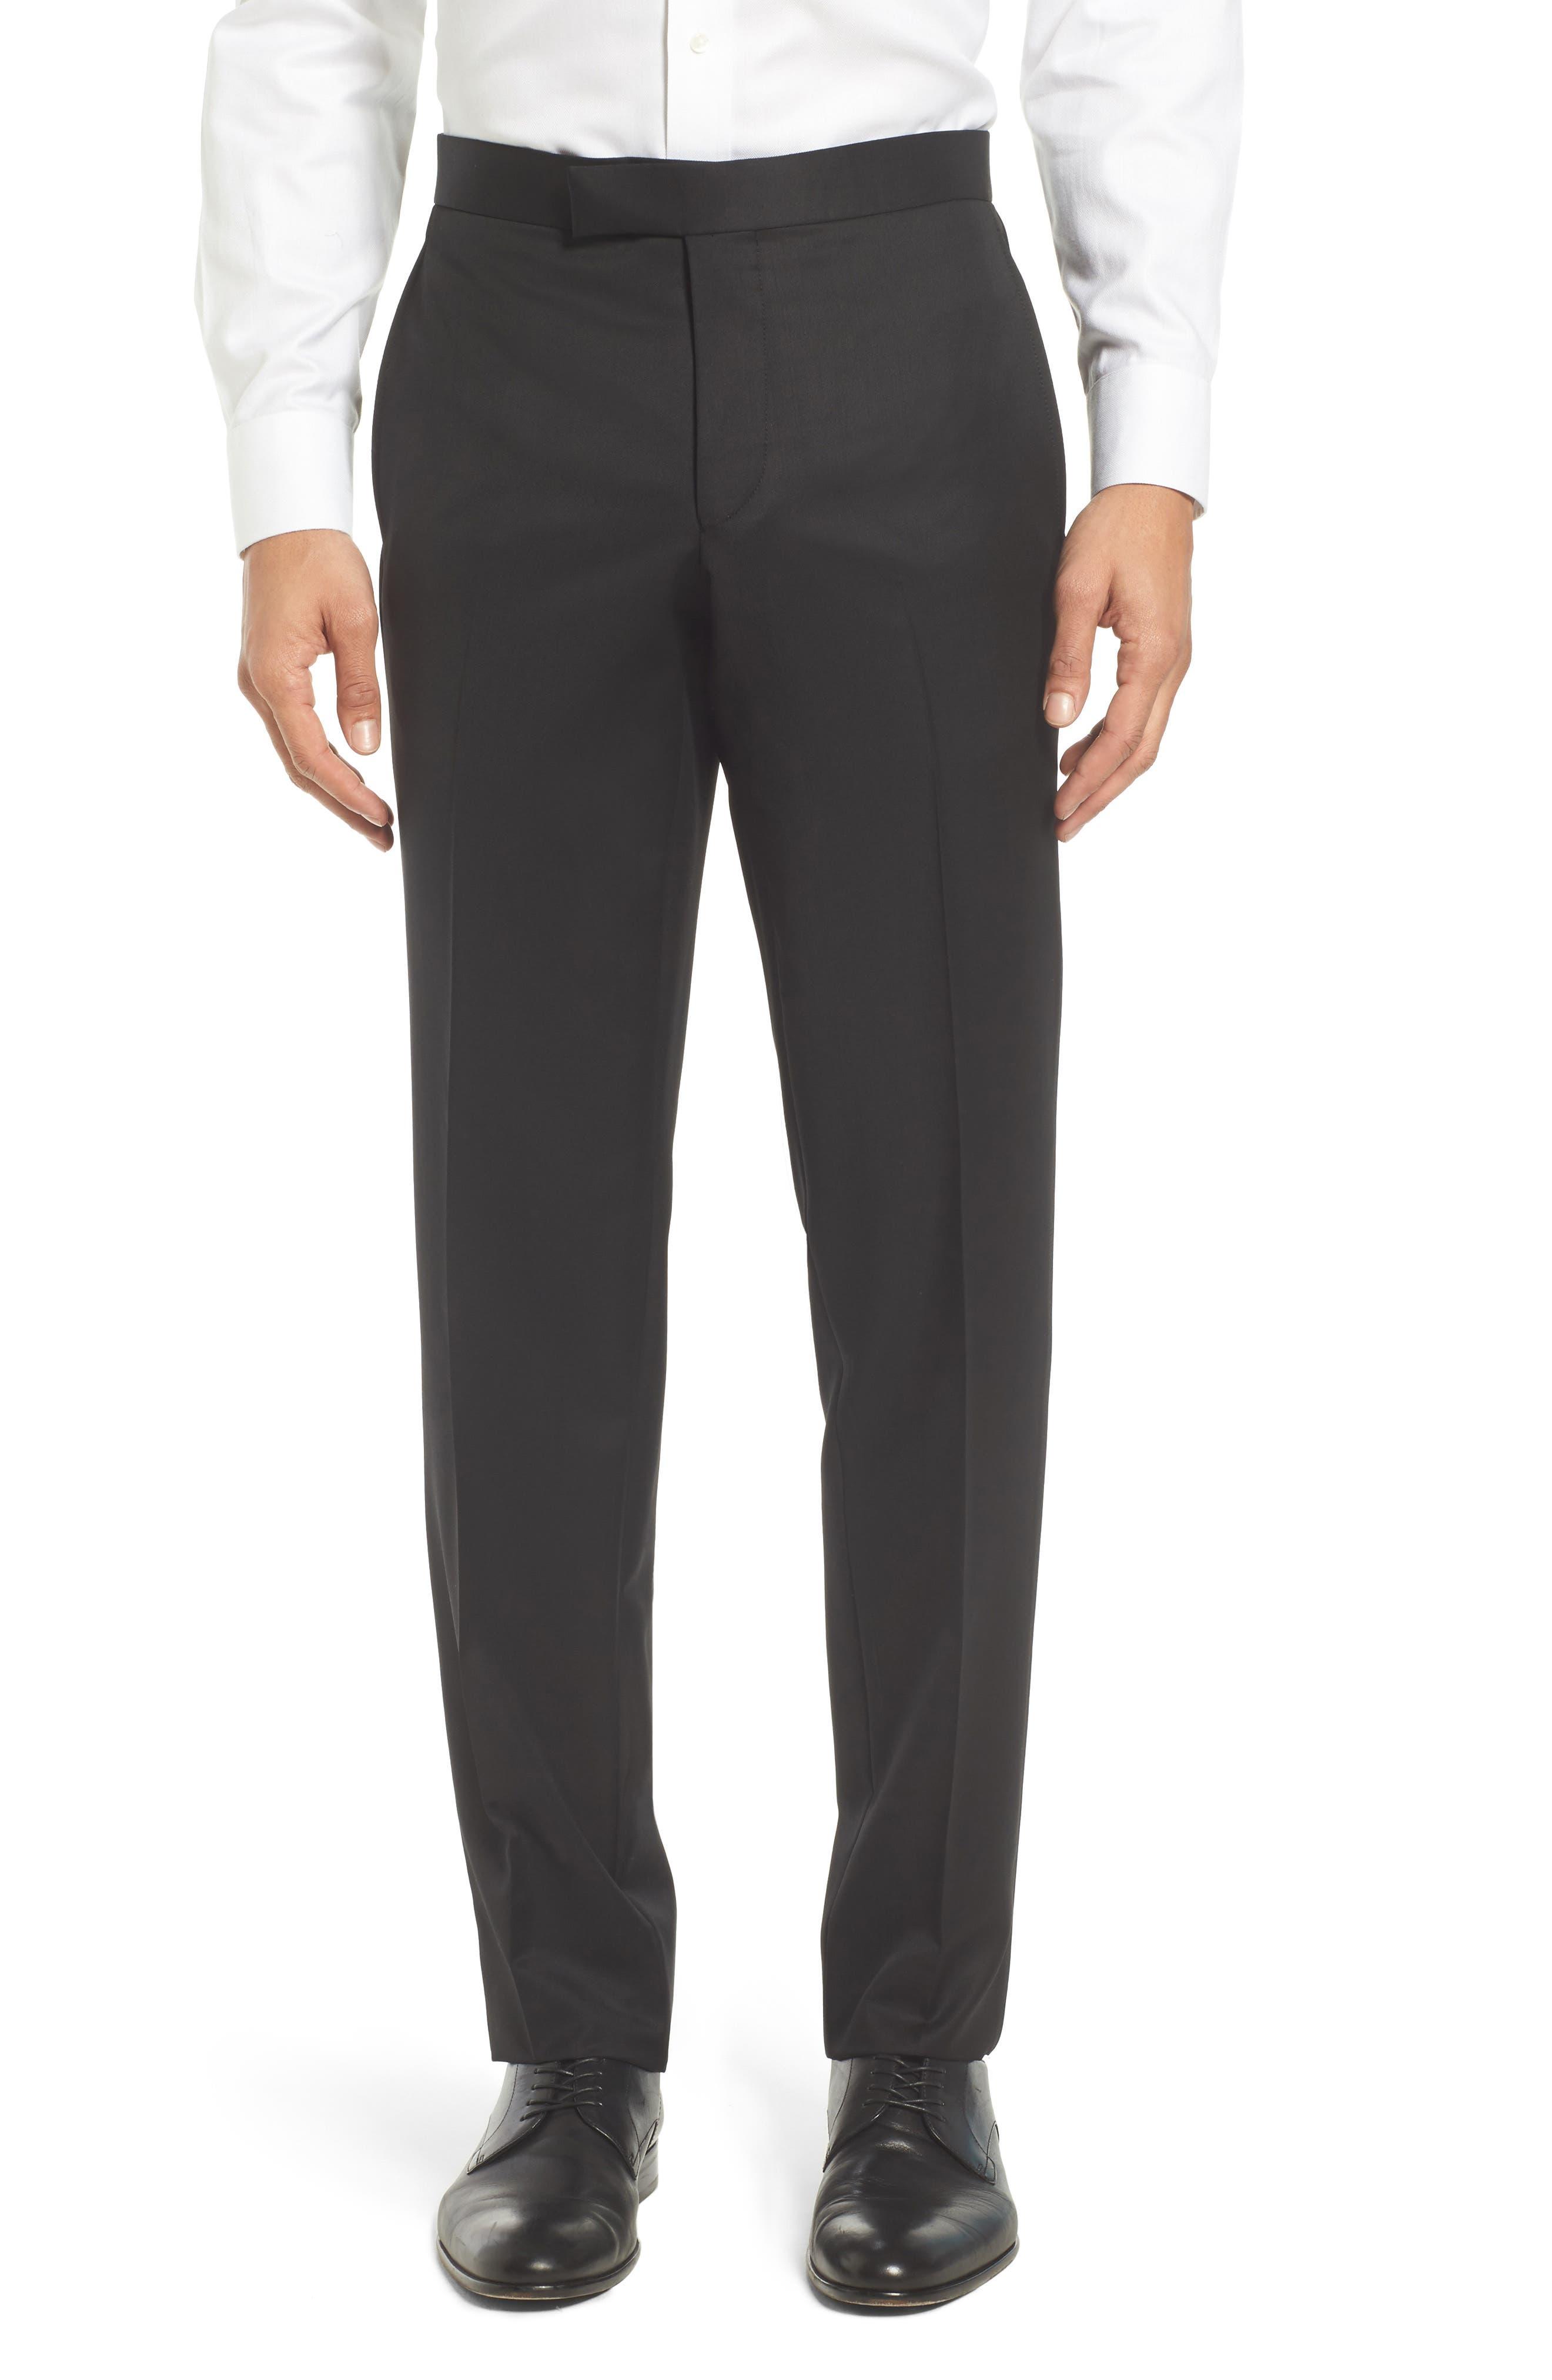 TED BAKER LONDON Josh Flat Front Wool & Mohair Tuxedo Pants, Main, color, BLACK